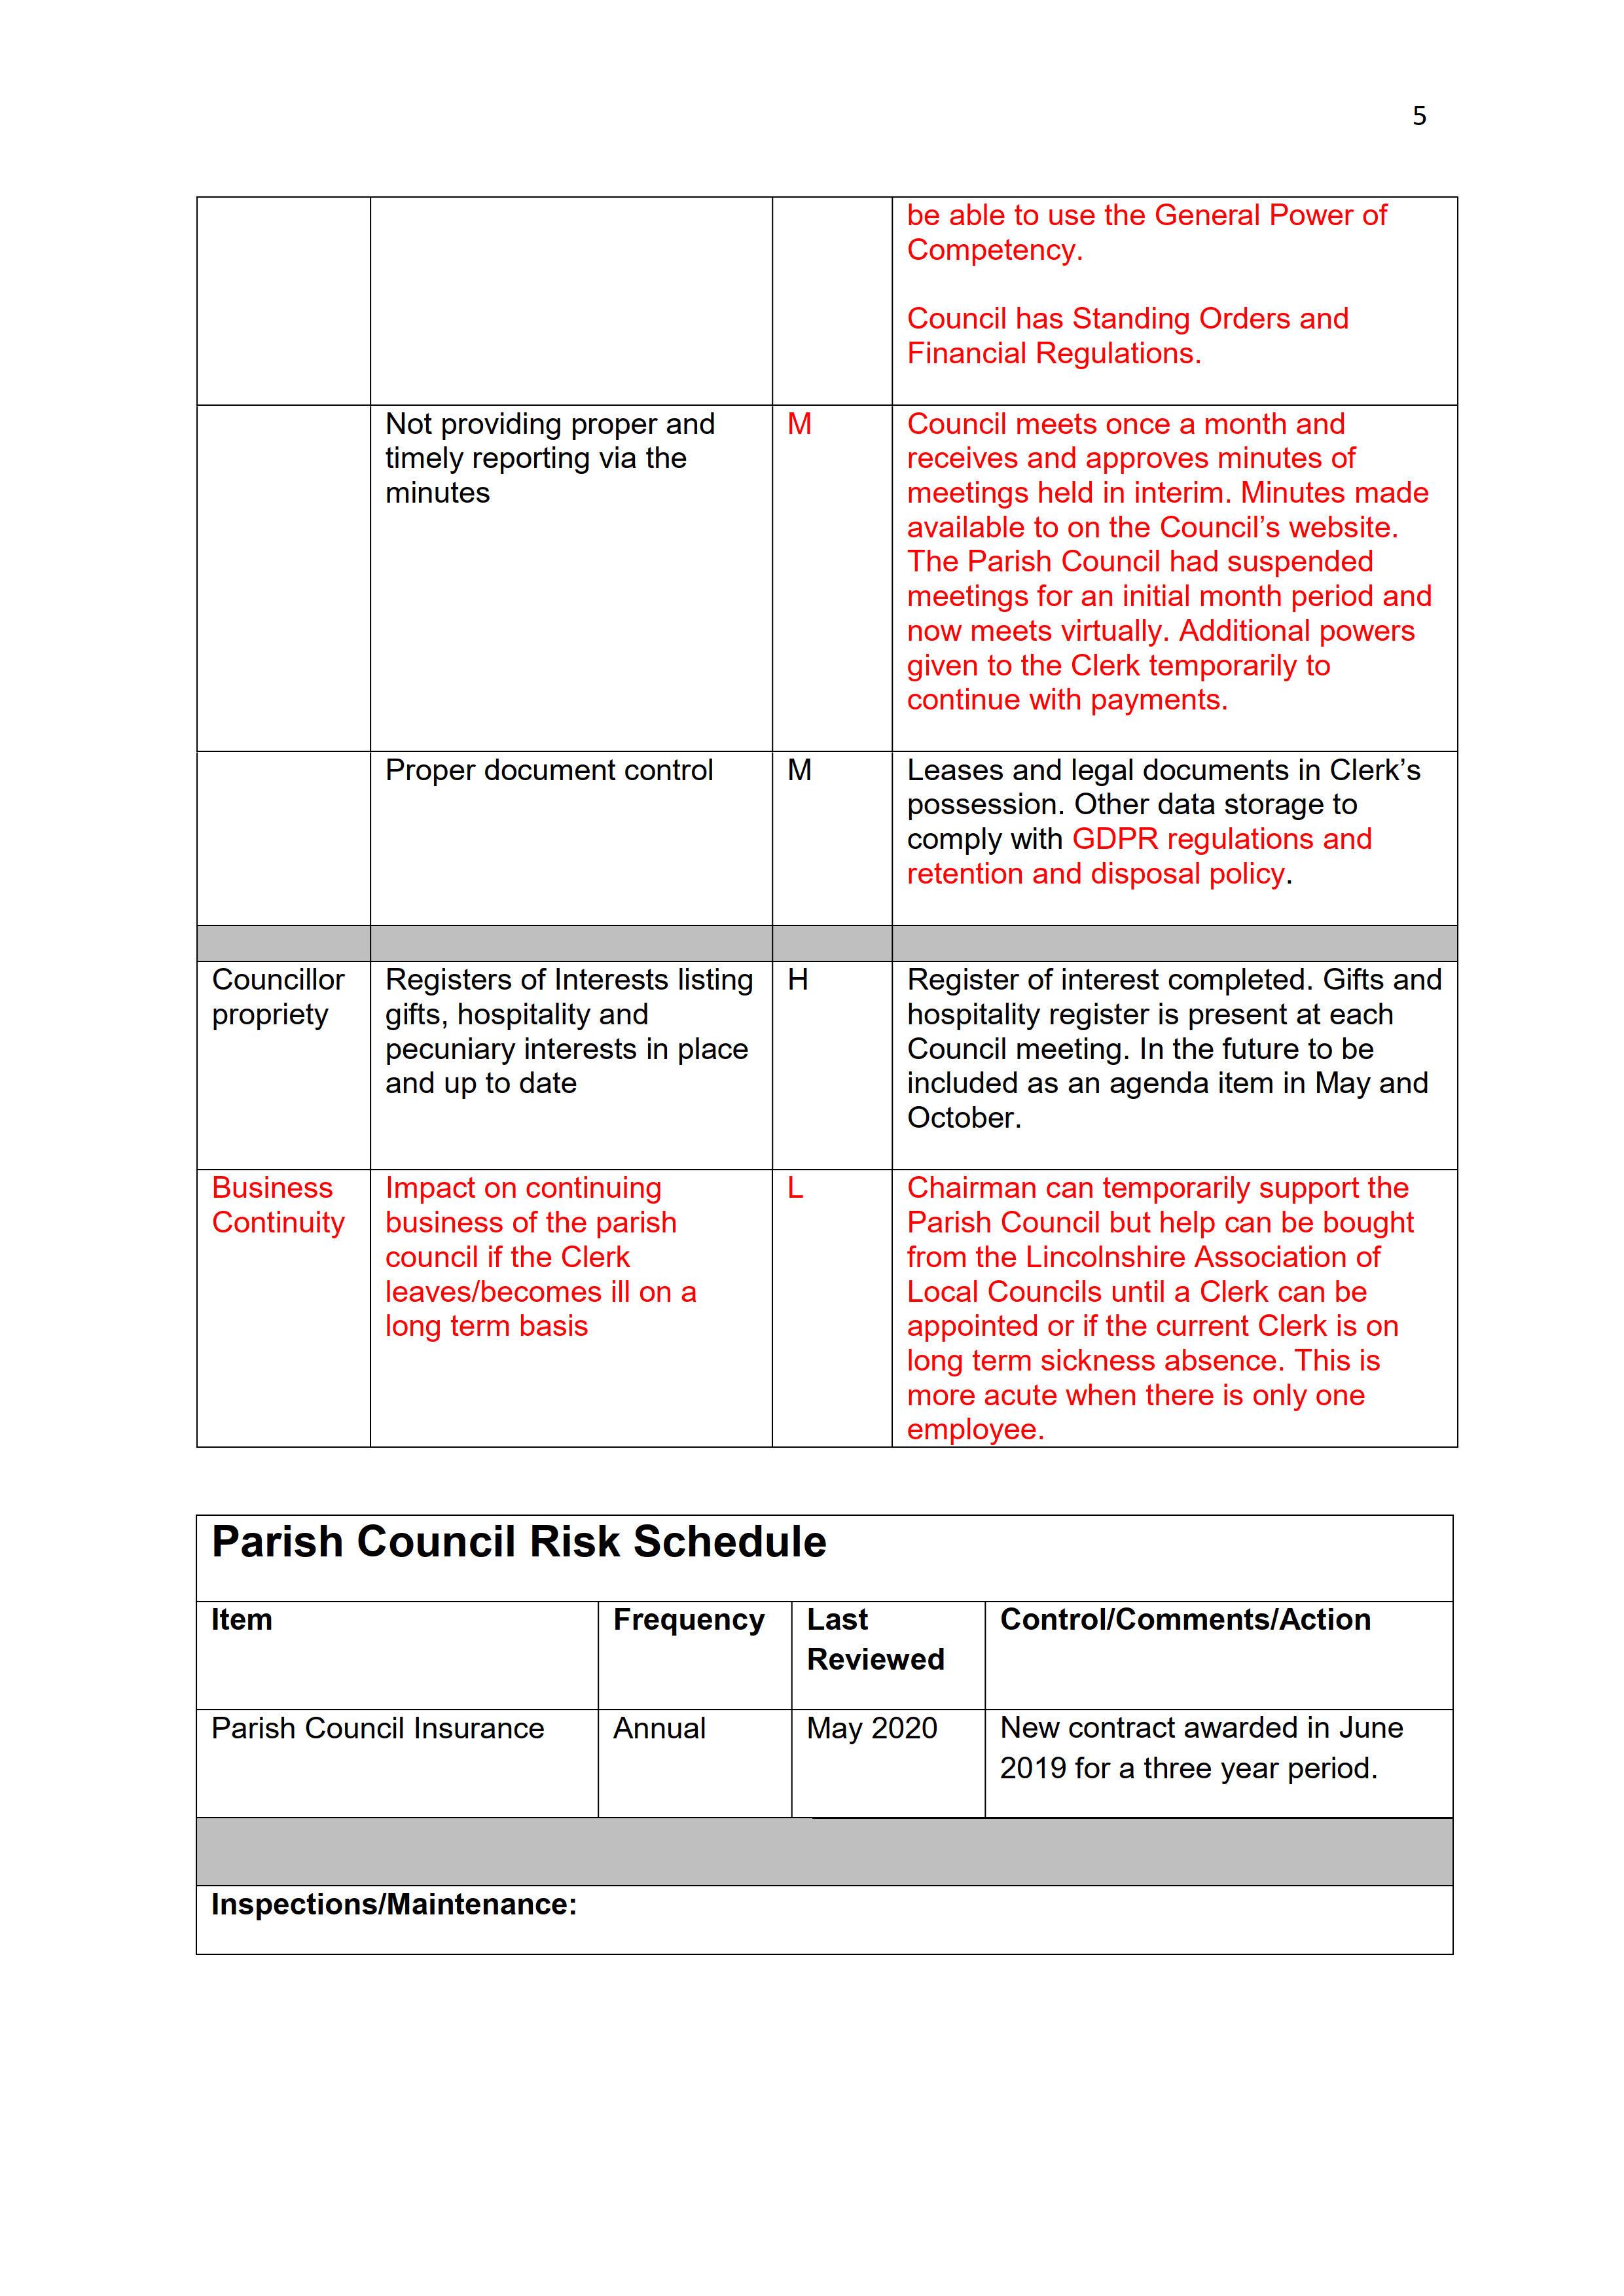 2021HCPC._Risk_Management_5.jpg